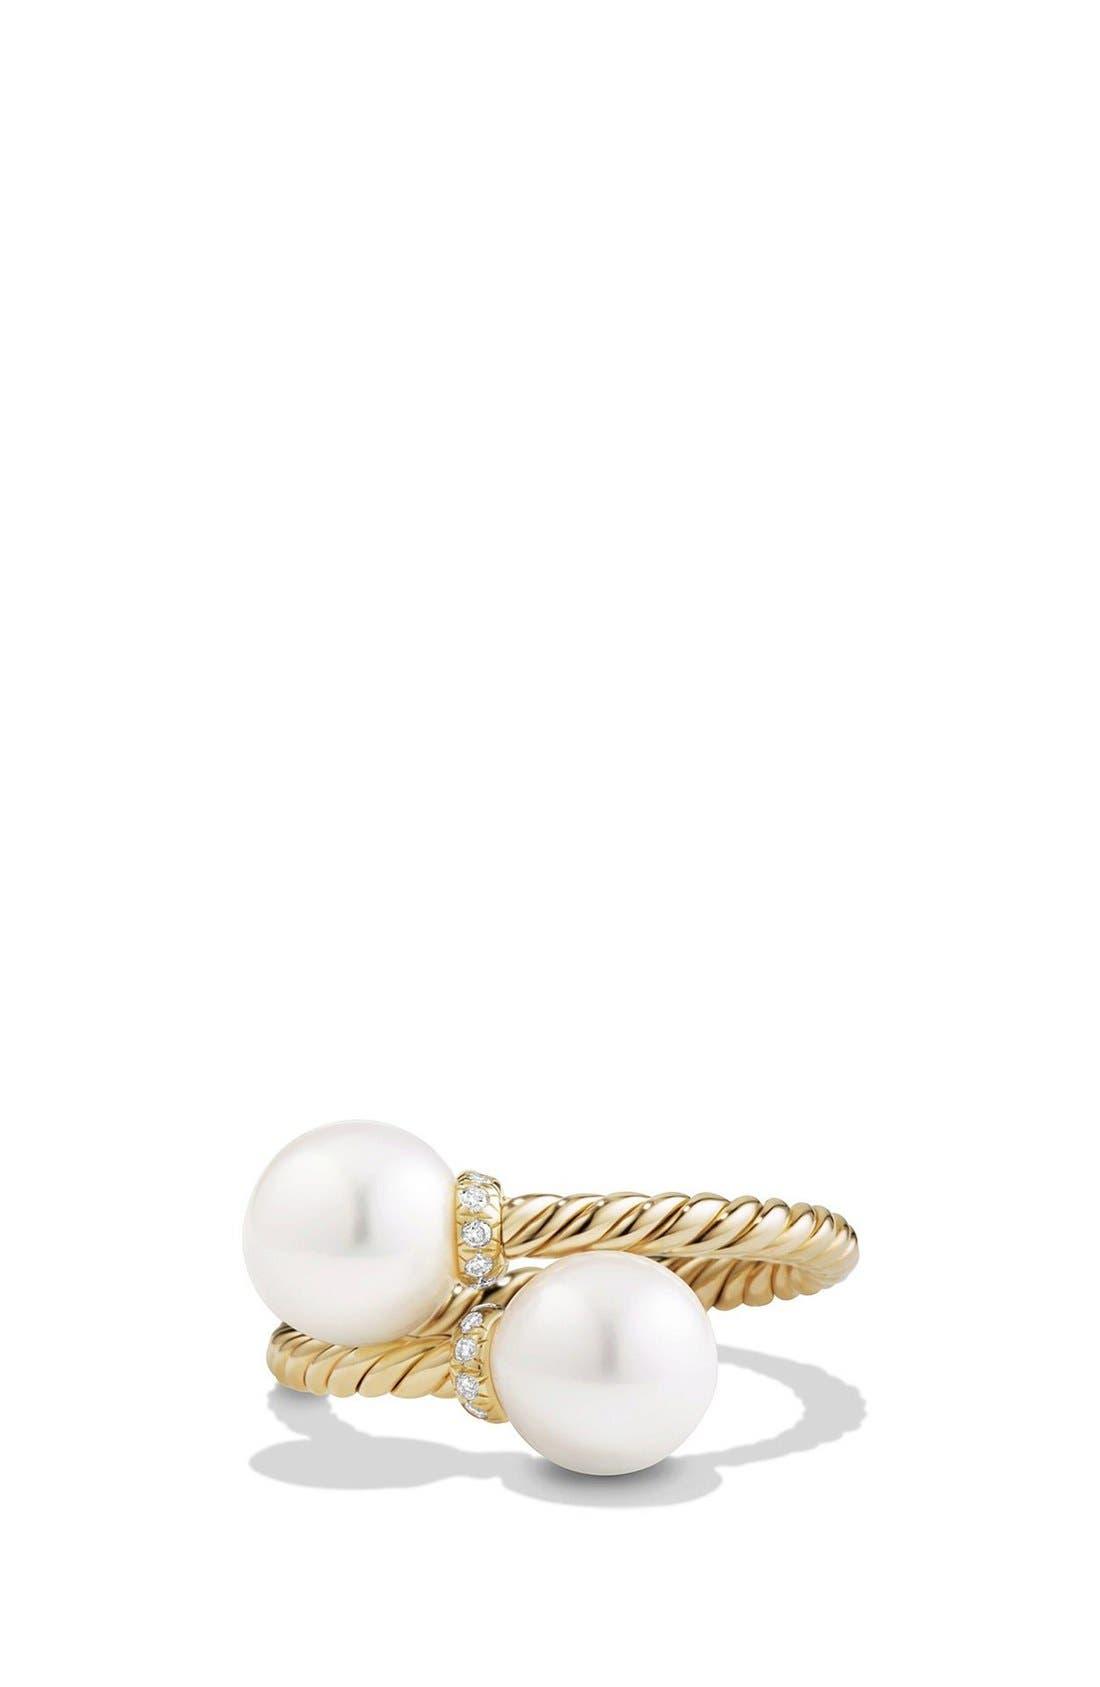 David Yurman 'Solari' Bead Ring with Diamonds and Pearls in 18K Gold